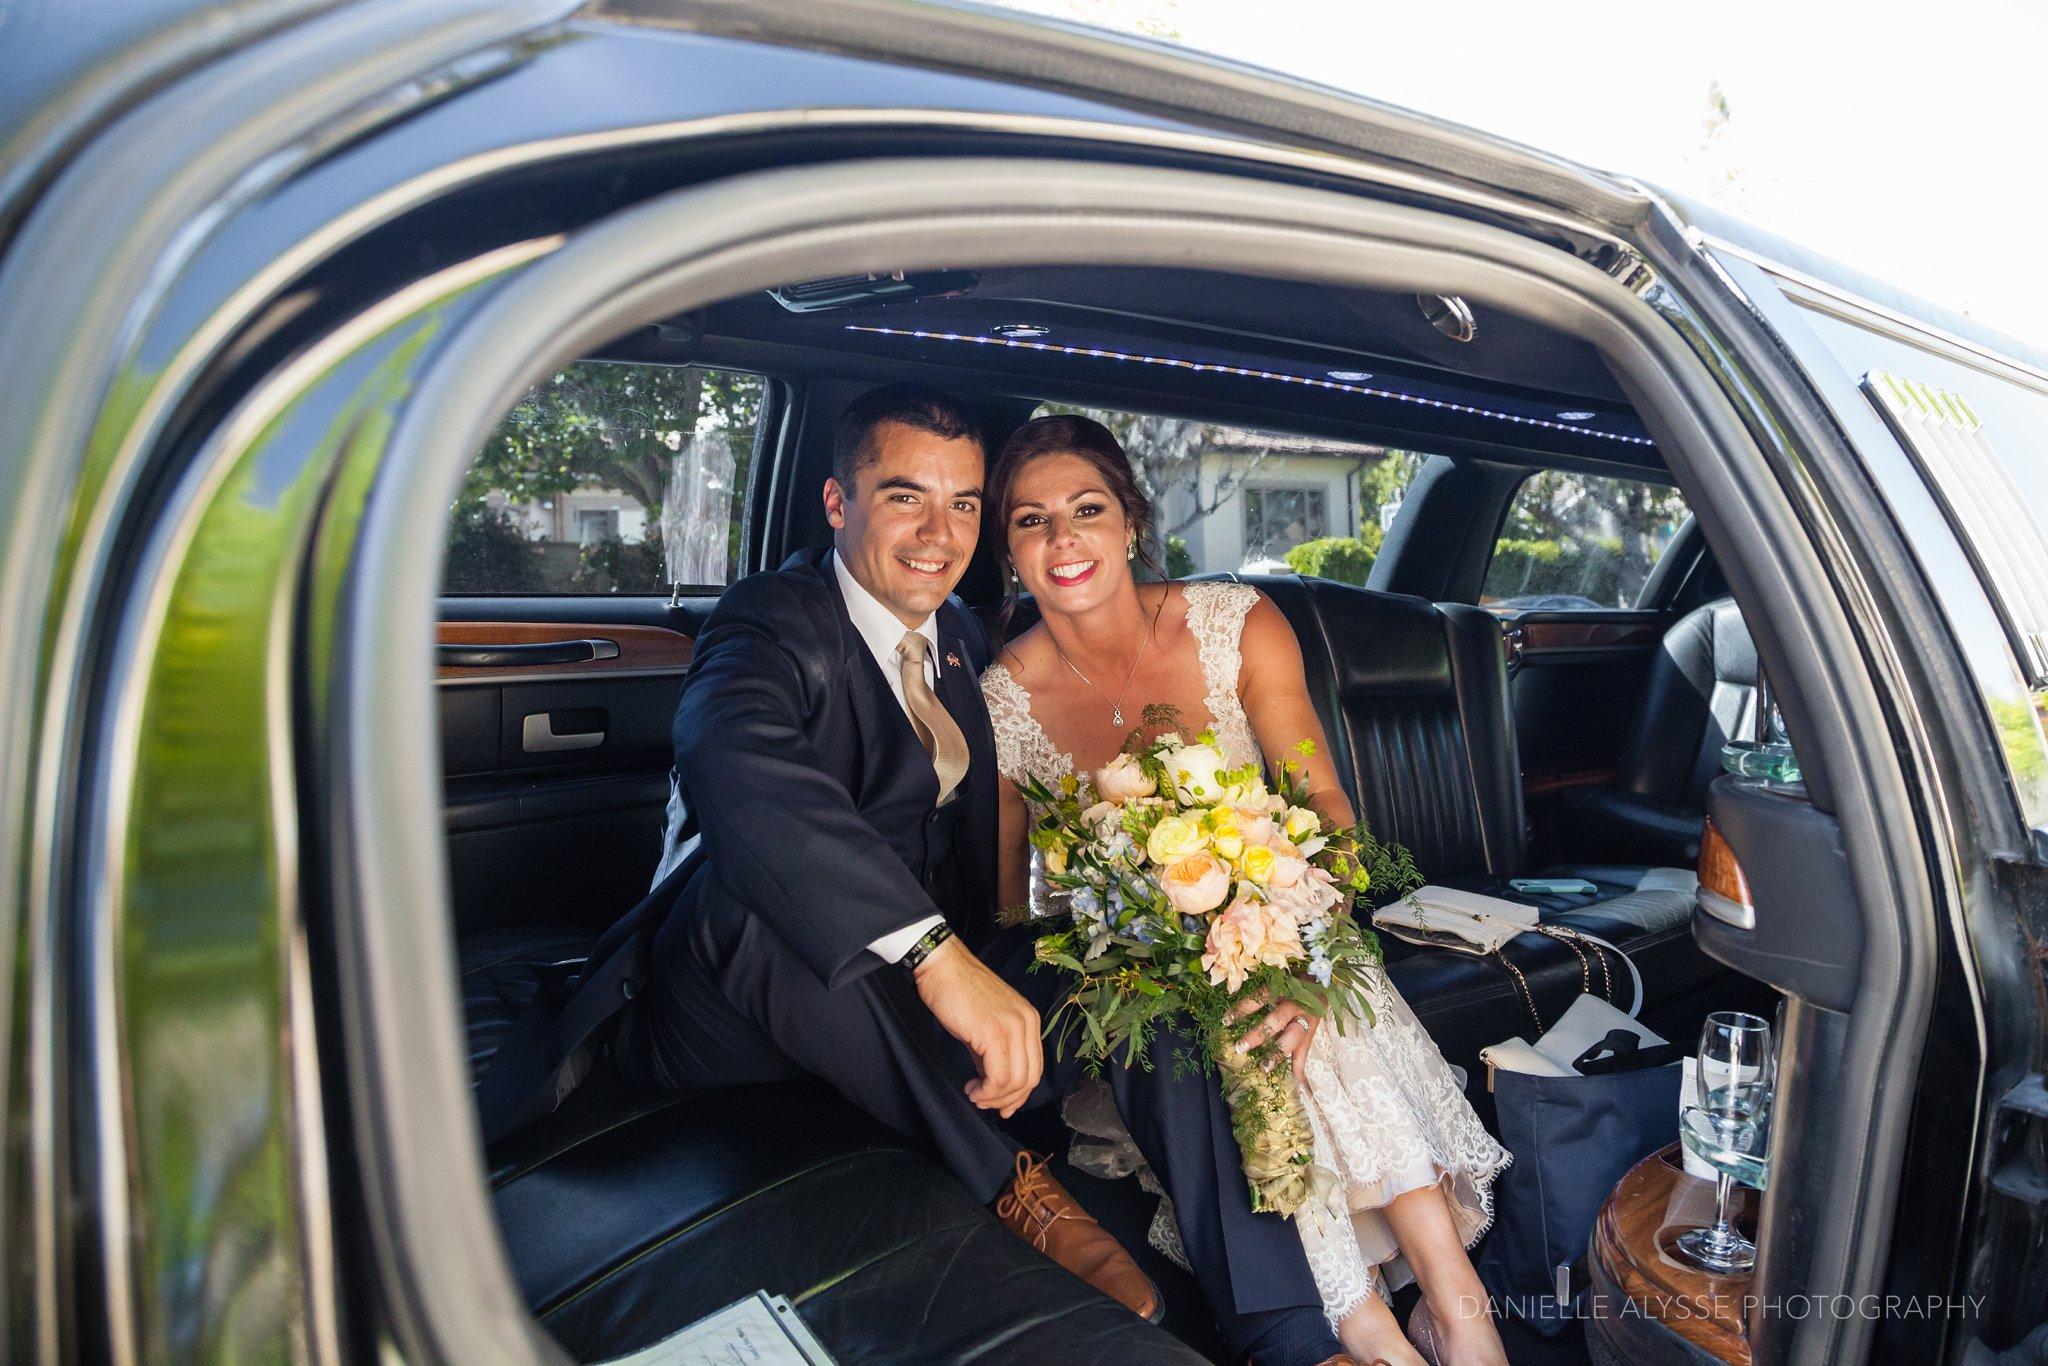 170429_blog_kimberly_ben_wedding_san_mateo_curiodyssey_danielle_alysse_photography_sacramento_photographer0656_WEB.jpg